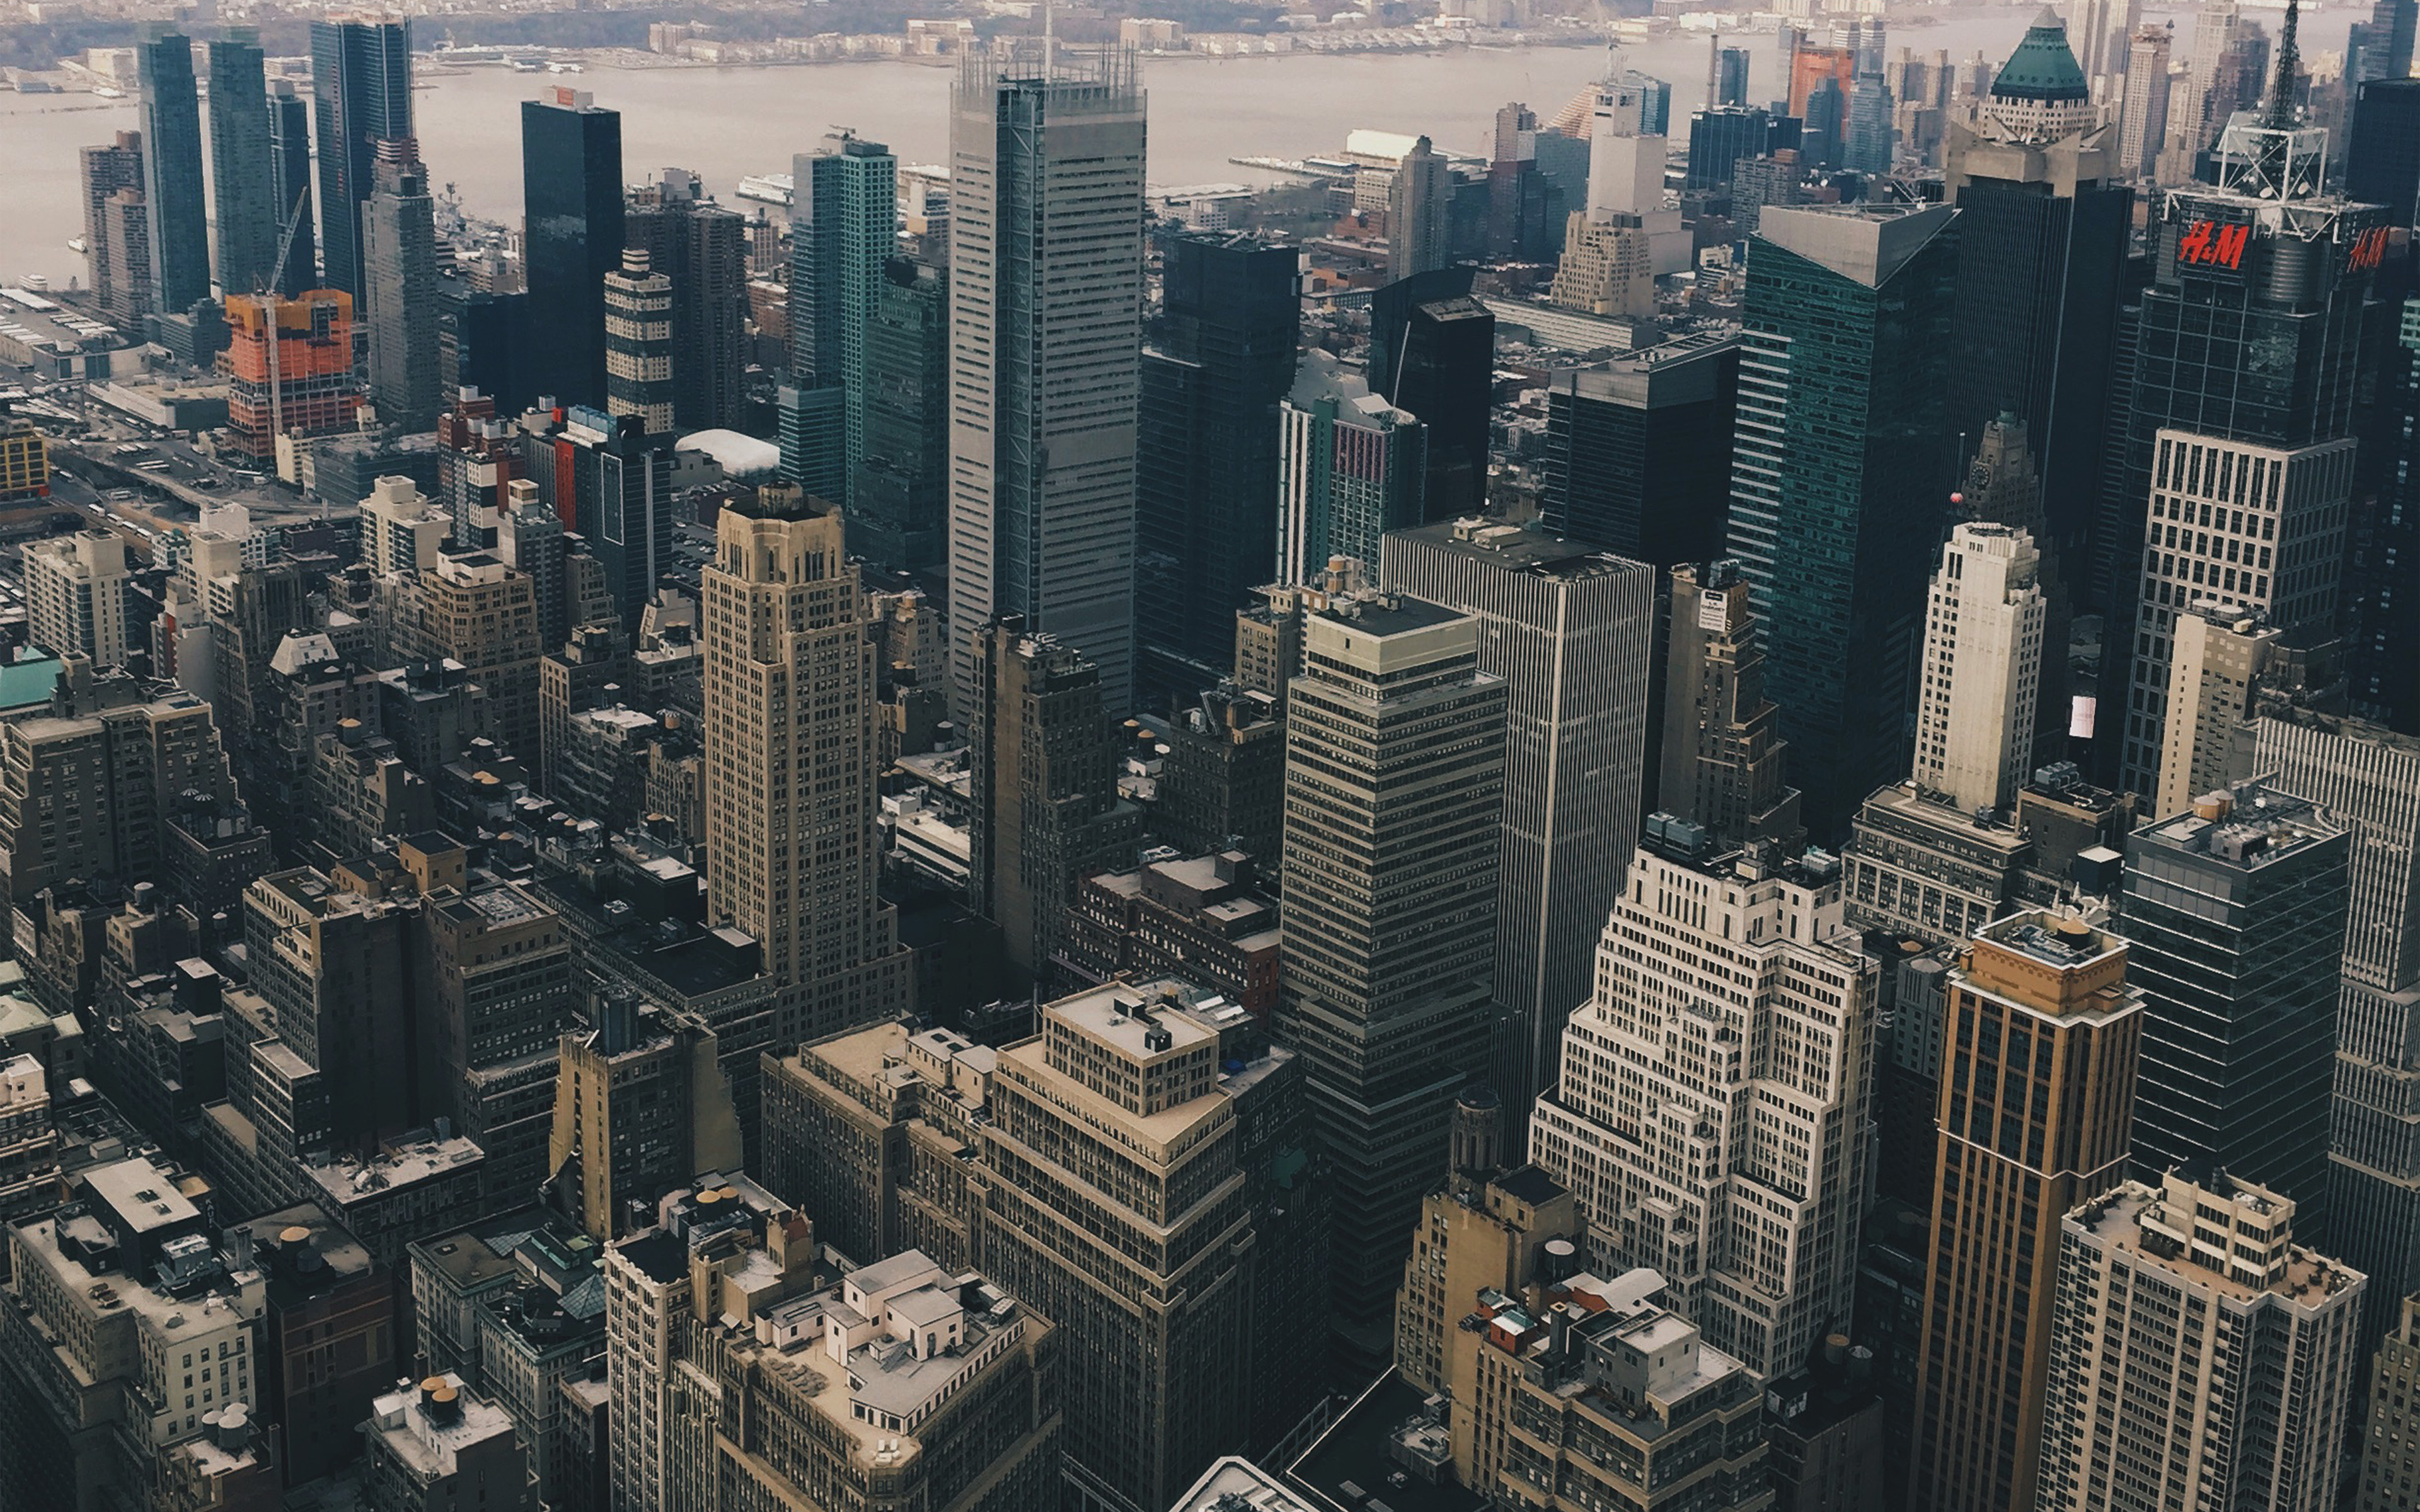 Mz13 Cityview Sky Newyork Hm River Wallpaper